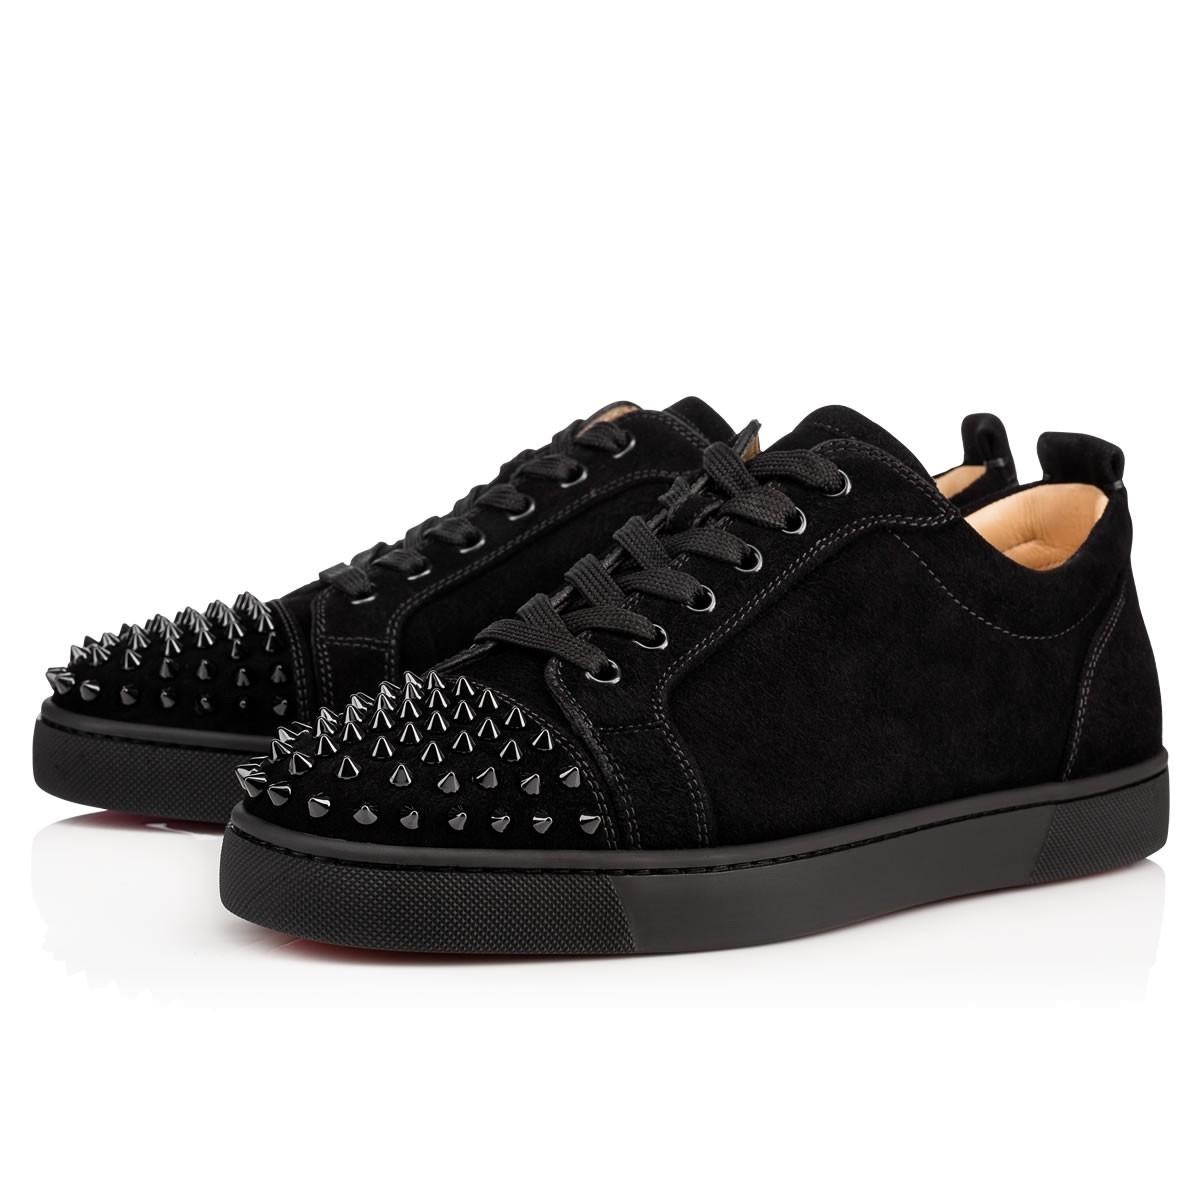 chaussure louboutin le prix